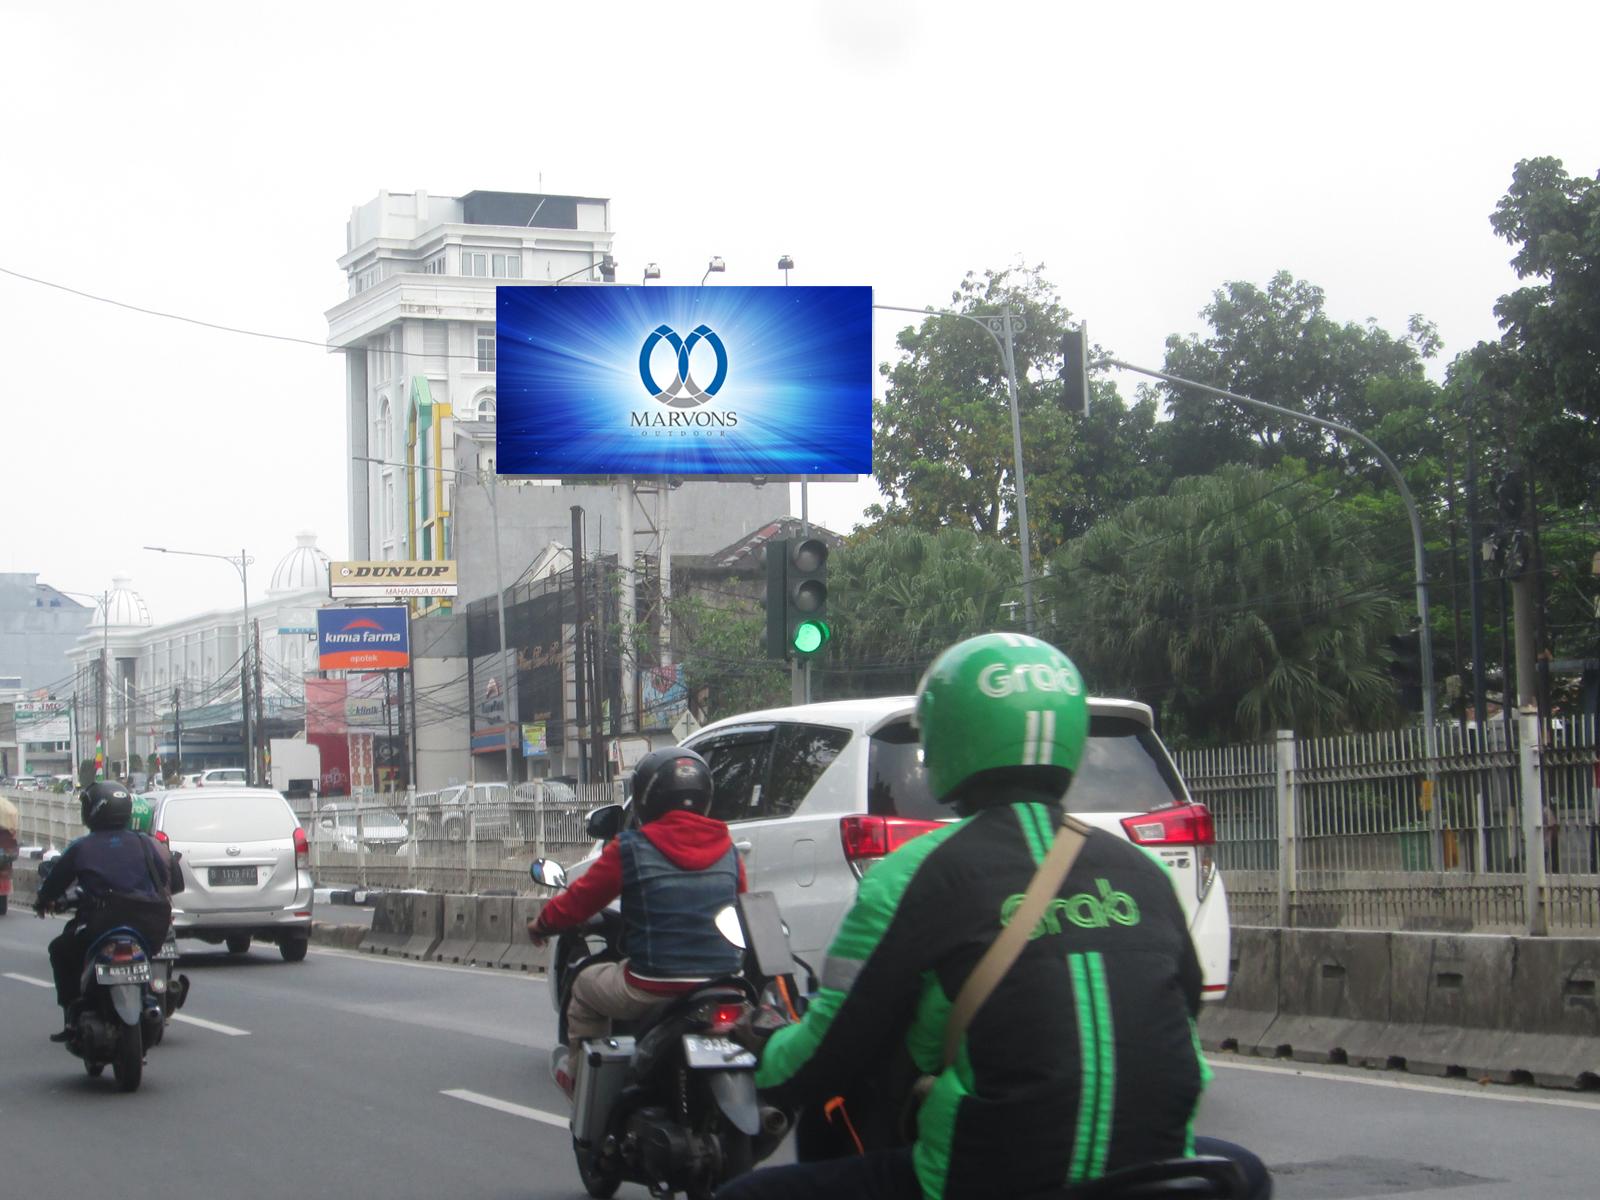 Warung Buncit (JMC) (MV 009) - 5 m x 10 m x 2 mk Horizontal